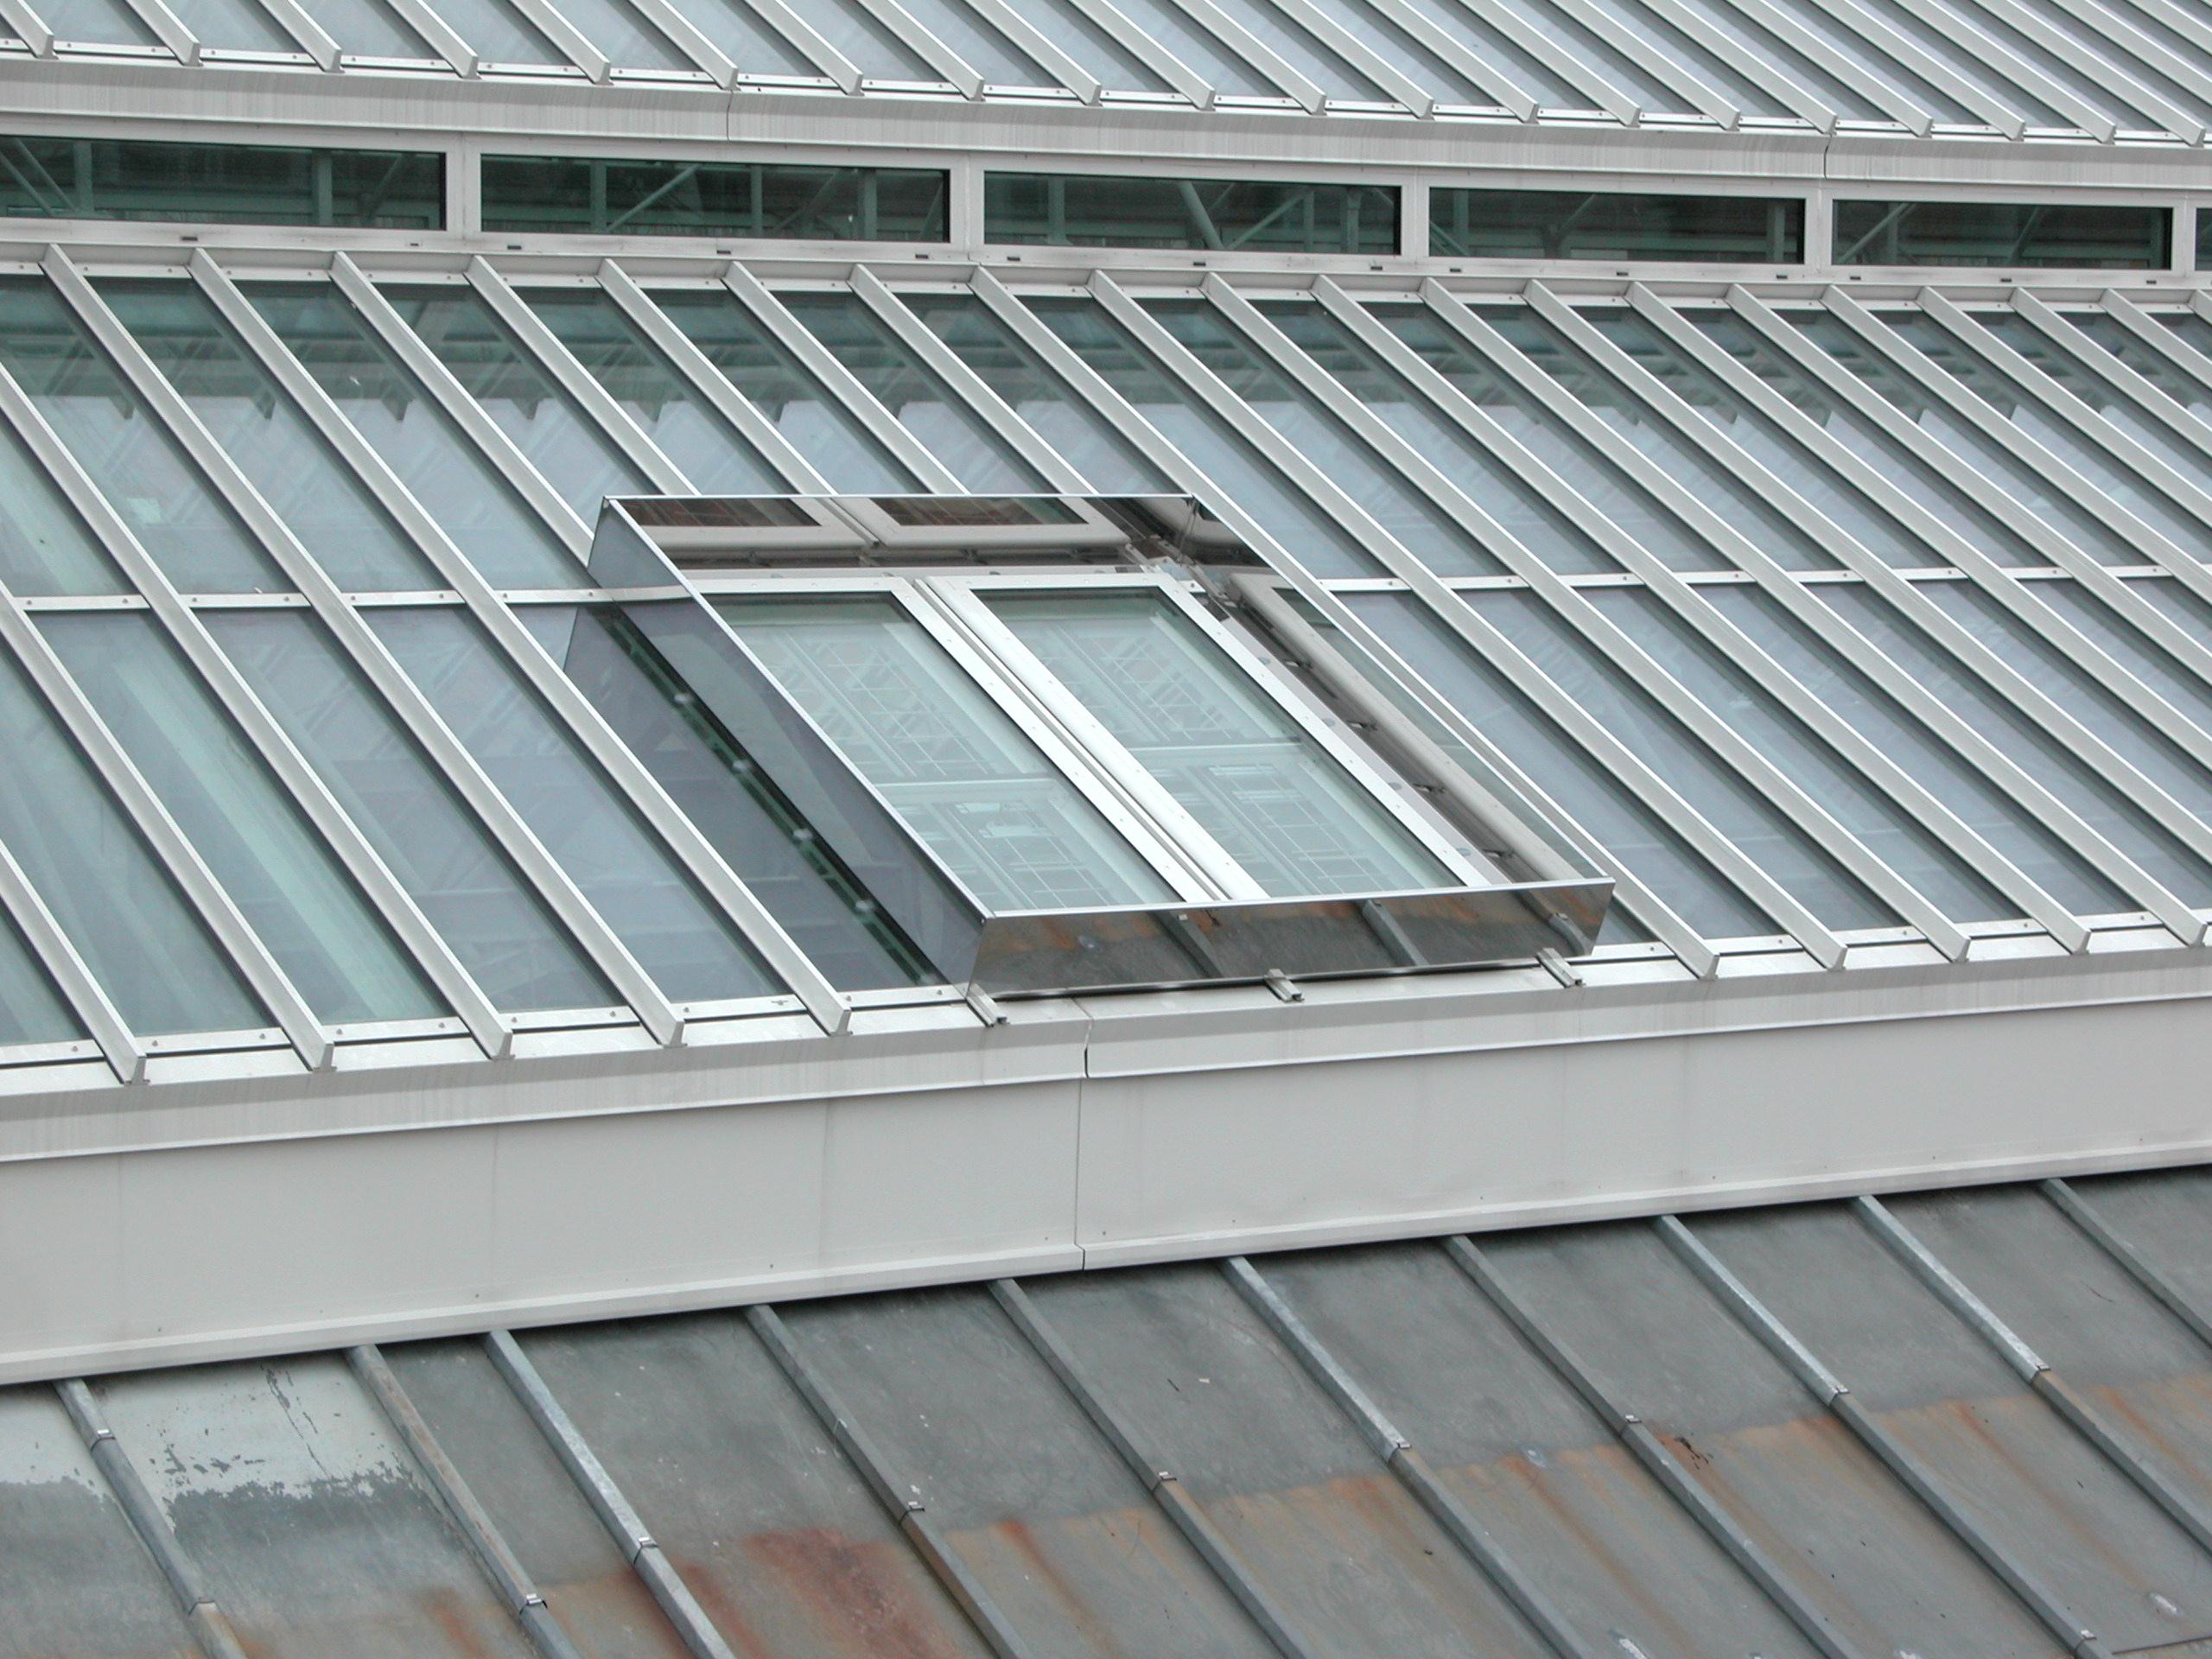 Photo of roof ventilation hatch